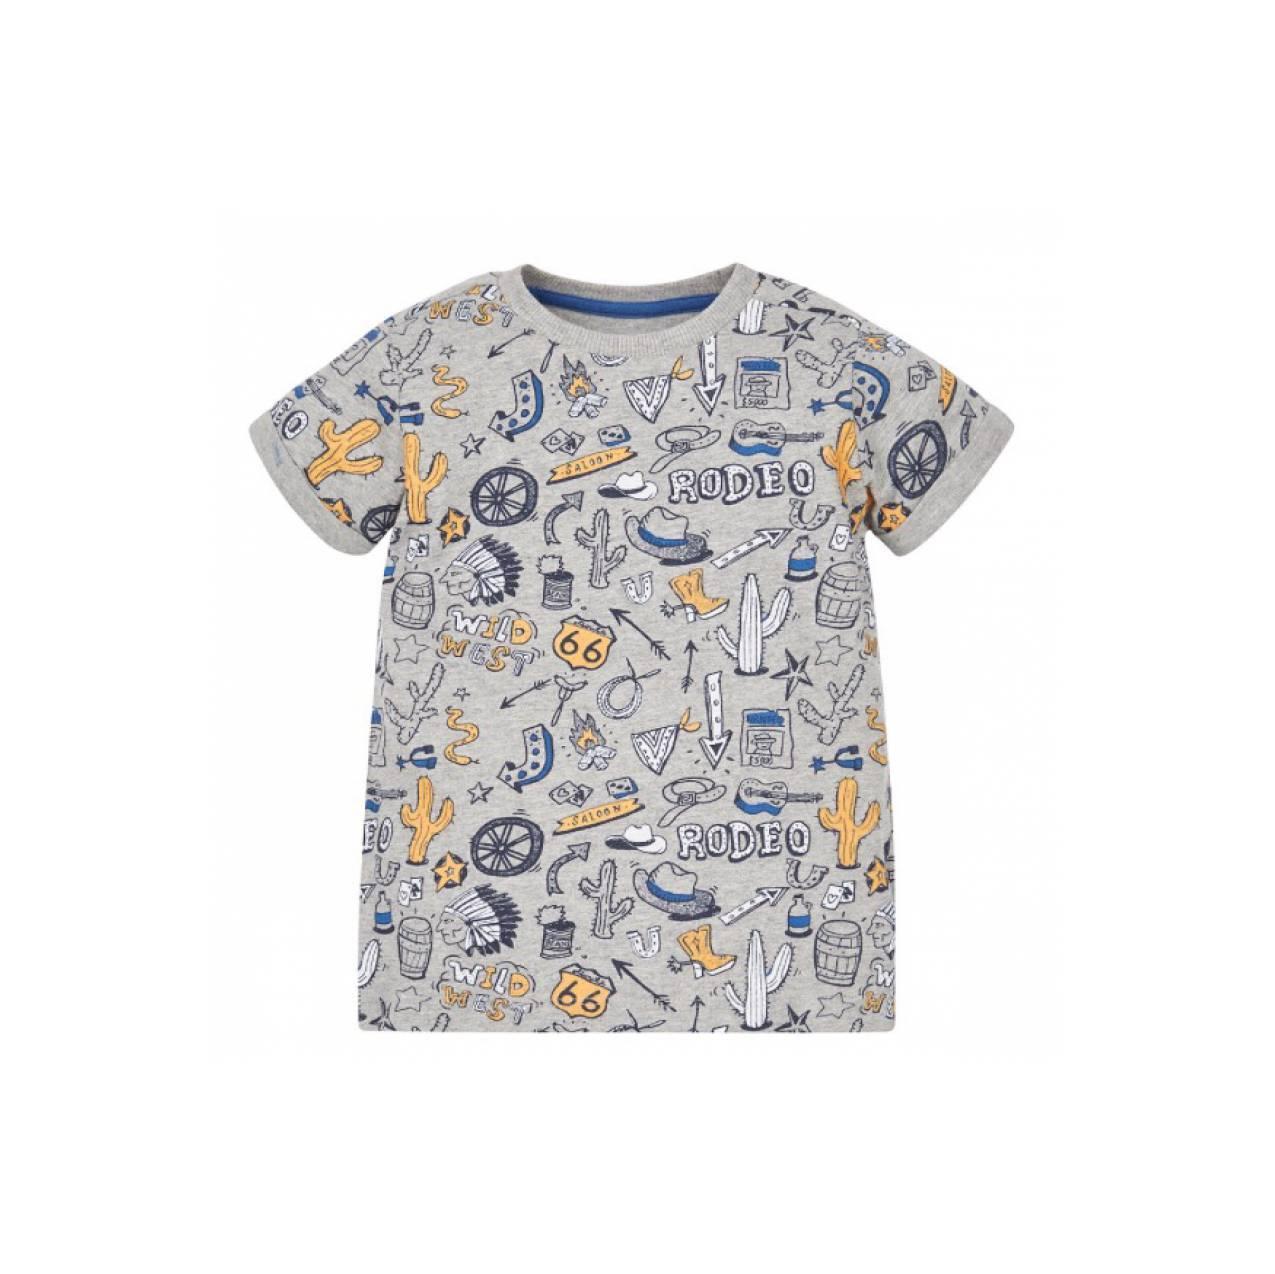 Tshirts mothercare